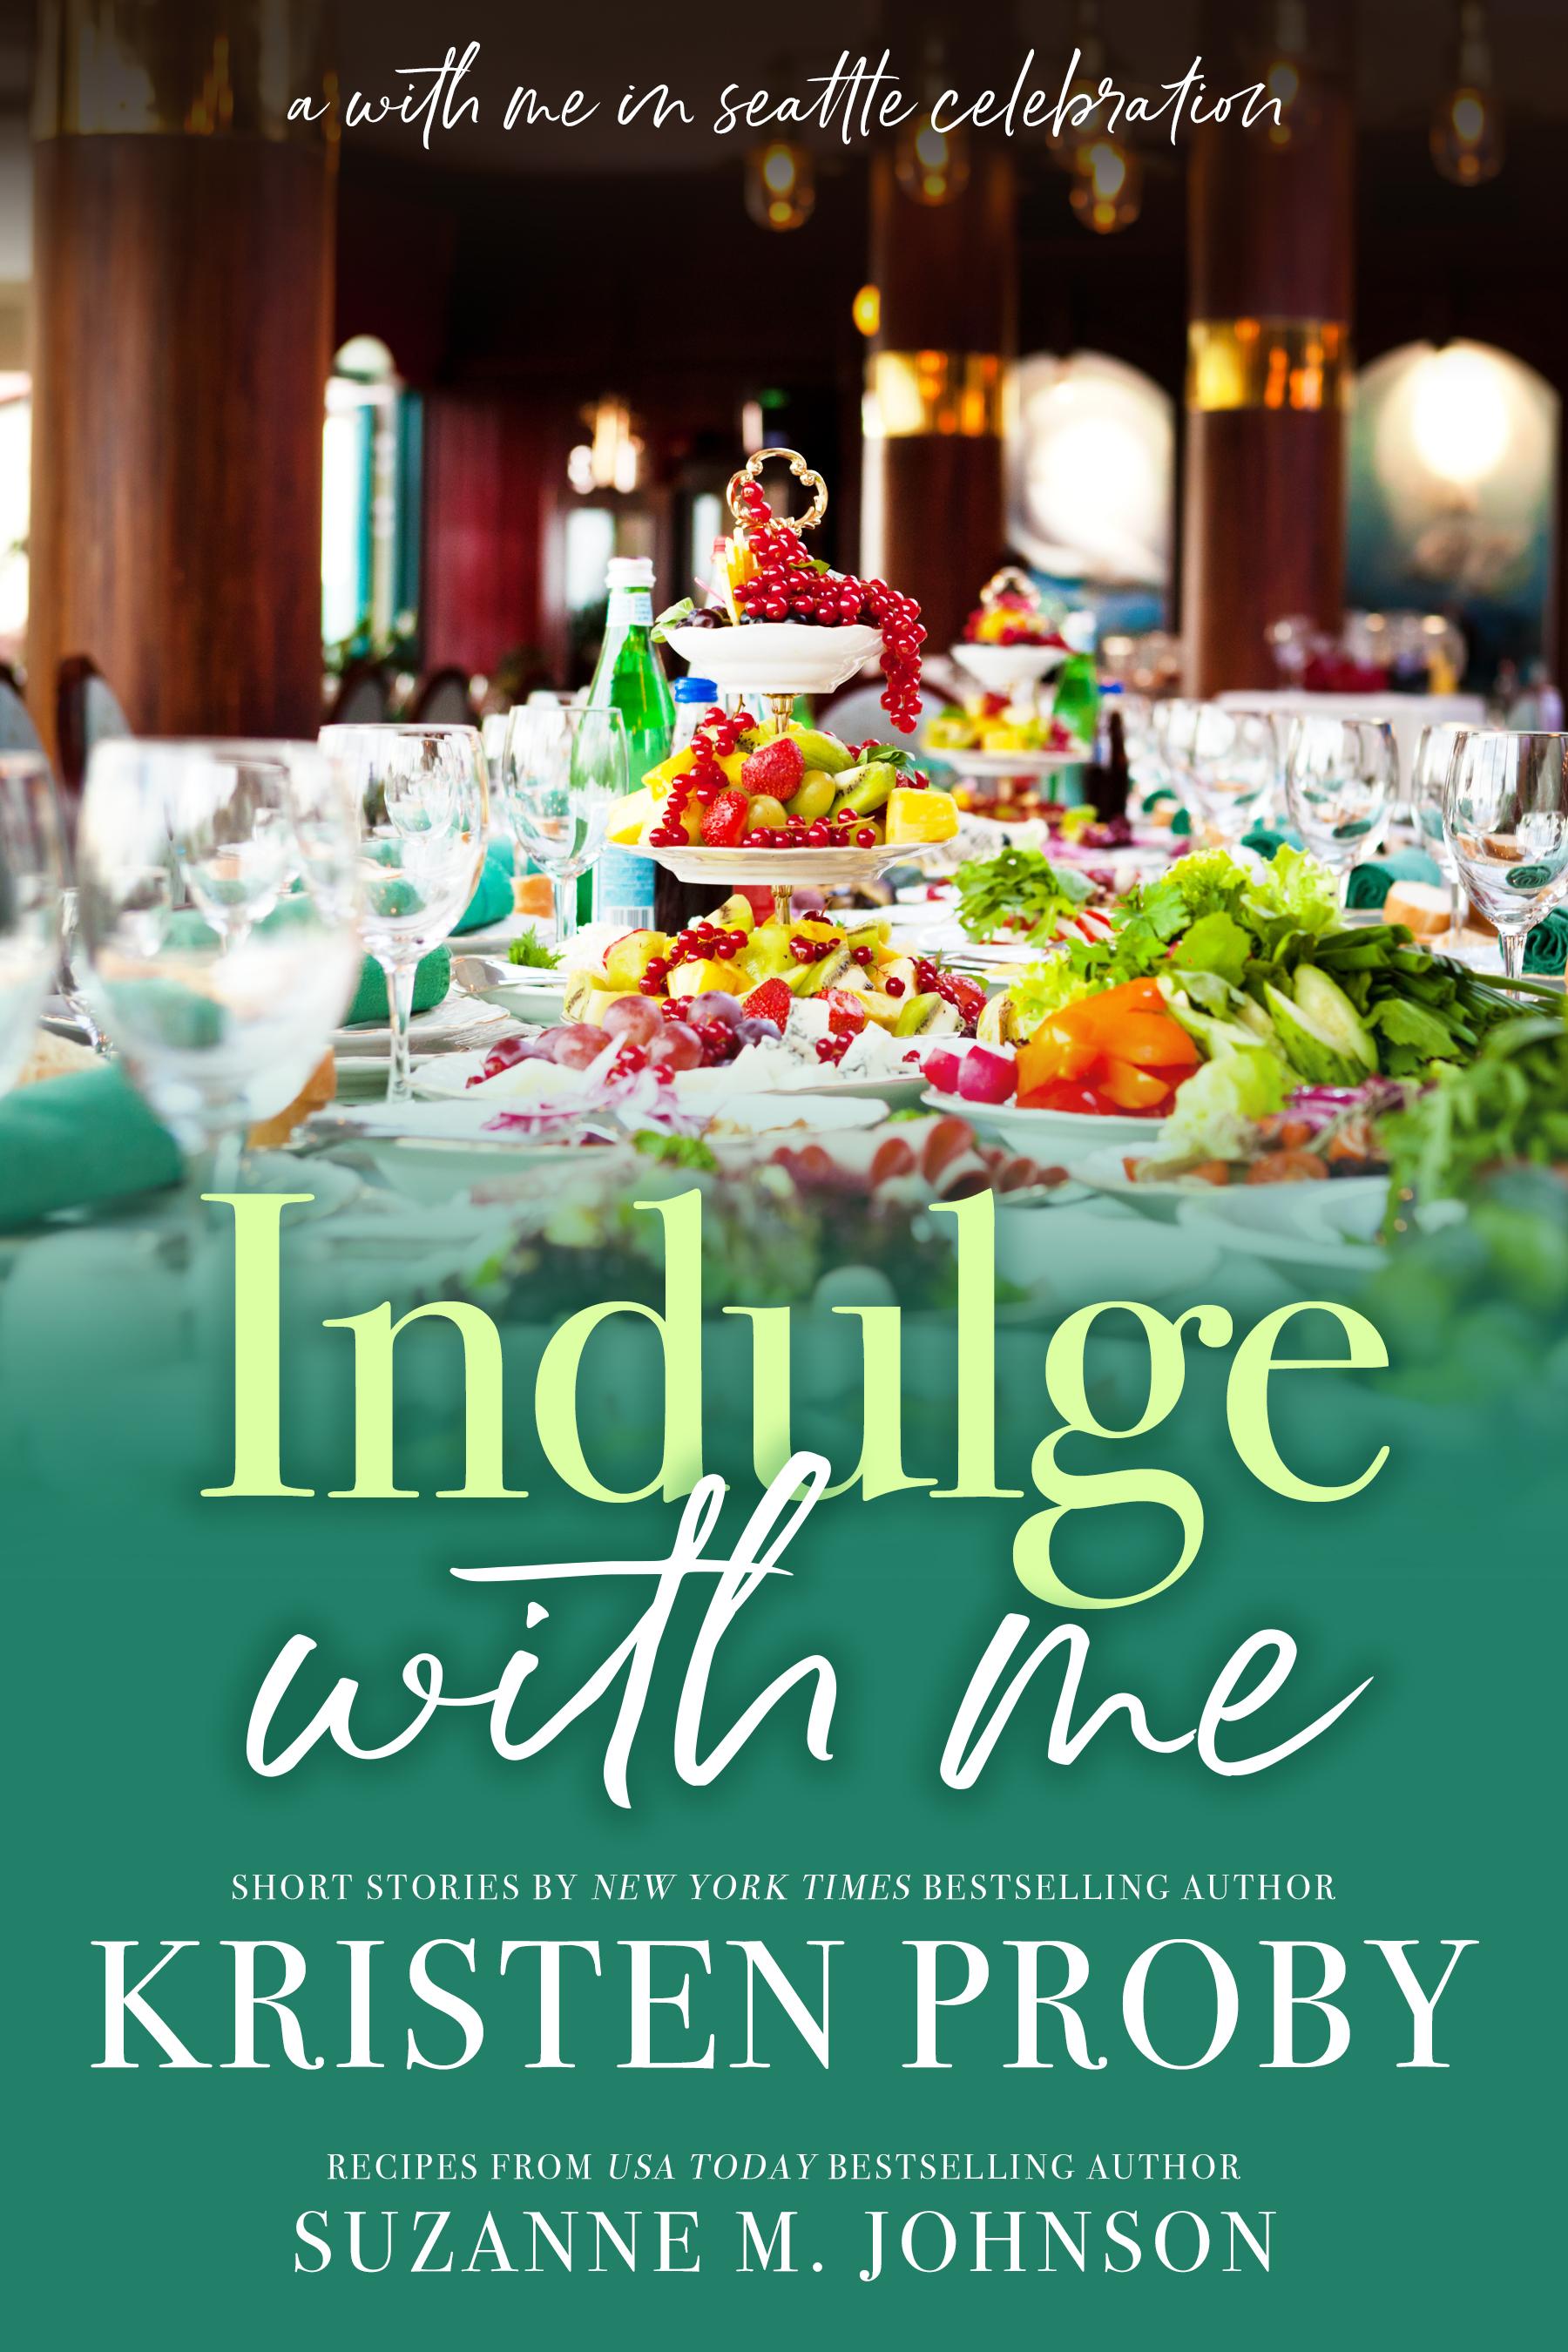 Indulge With Me Cookbook_300dpi.jpg